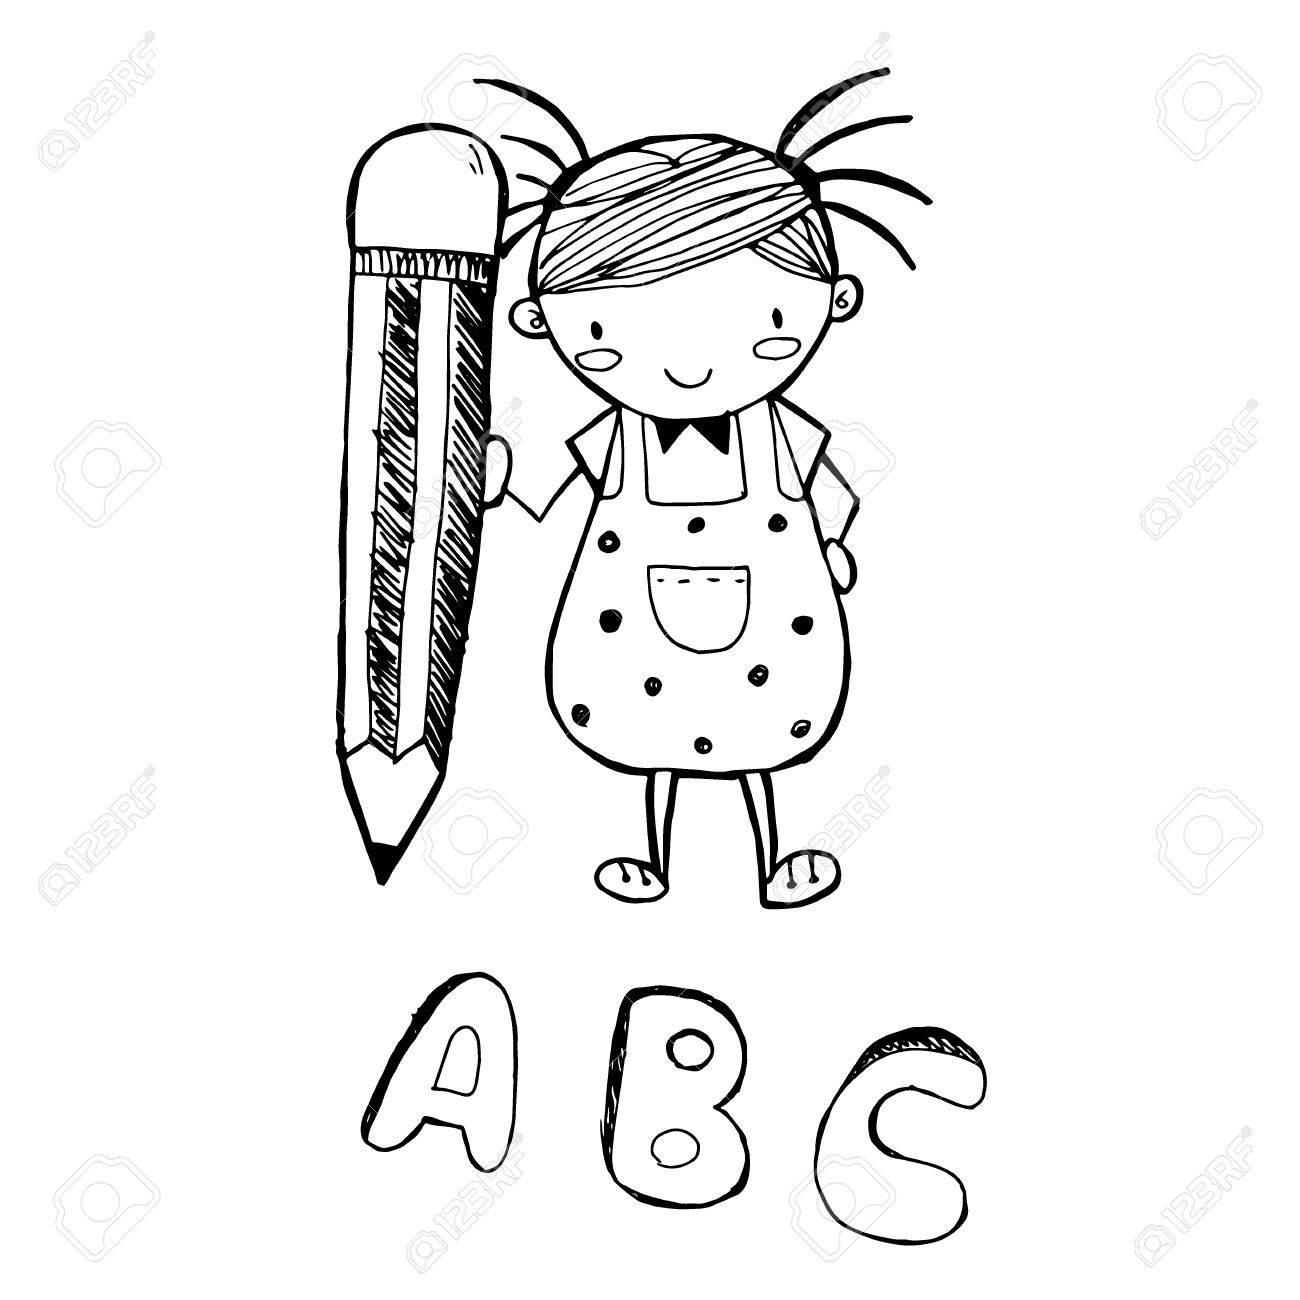 1300x1300 Cute Girl Cartoon Drawing A B C In Black Line Doodle Vector